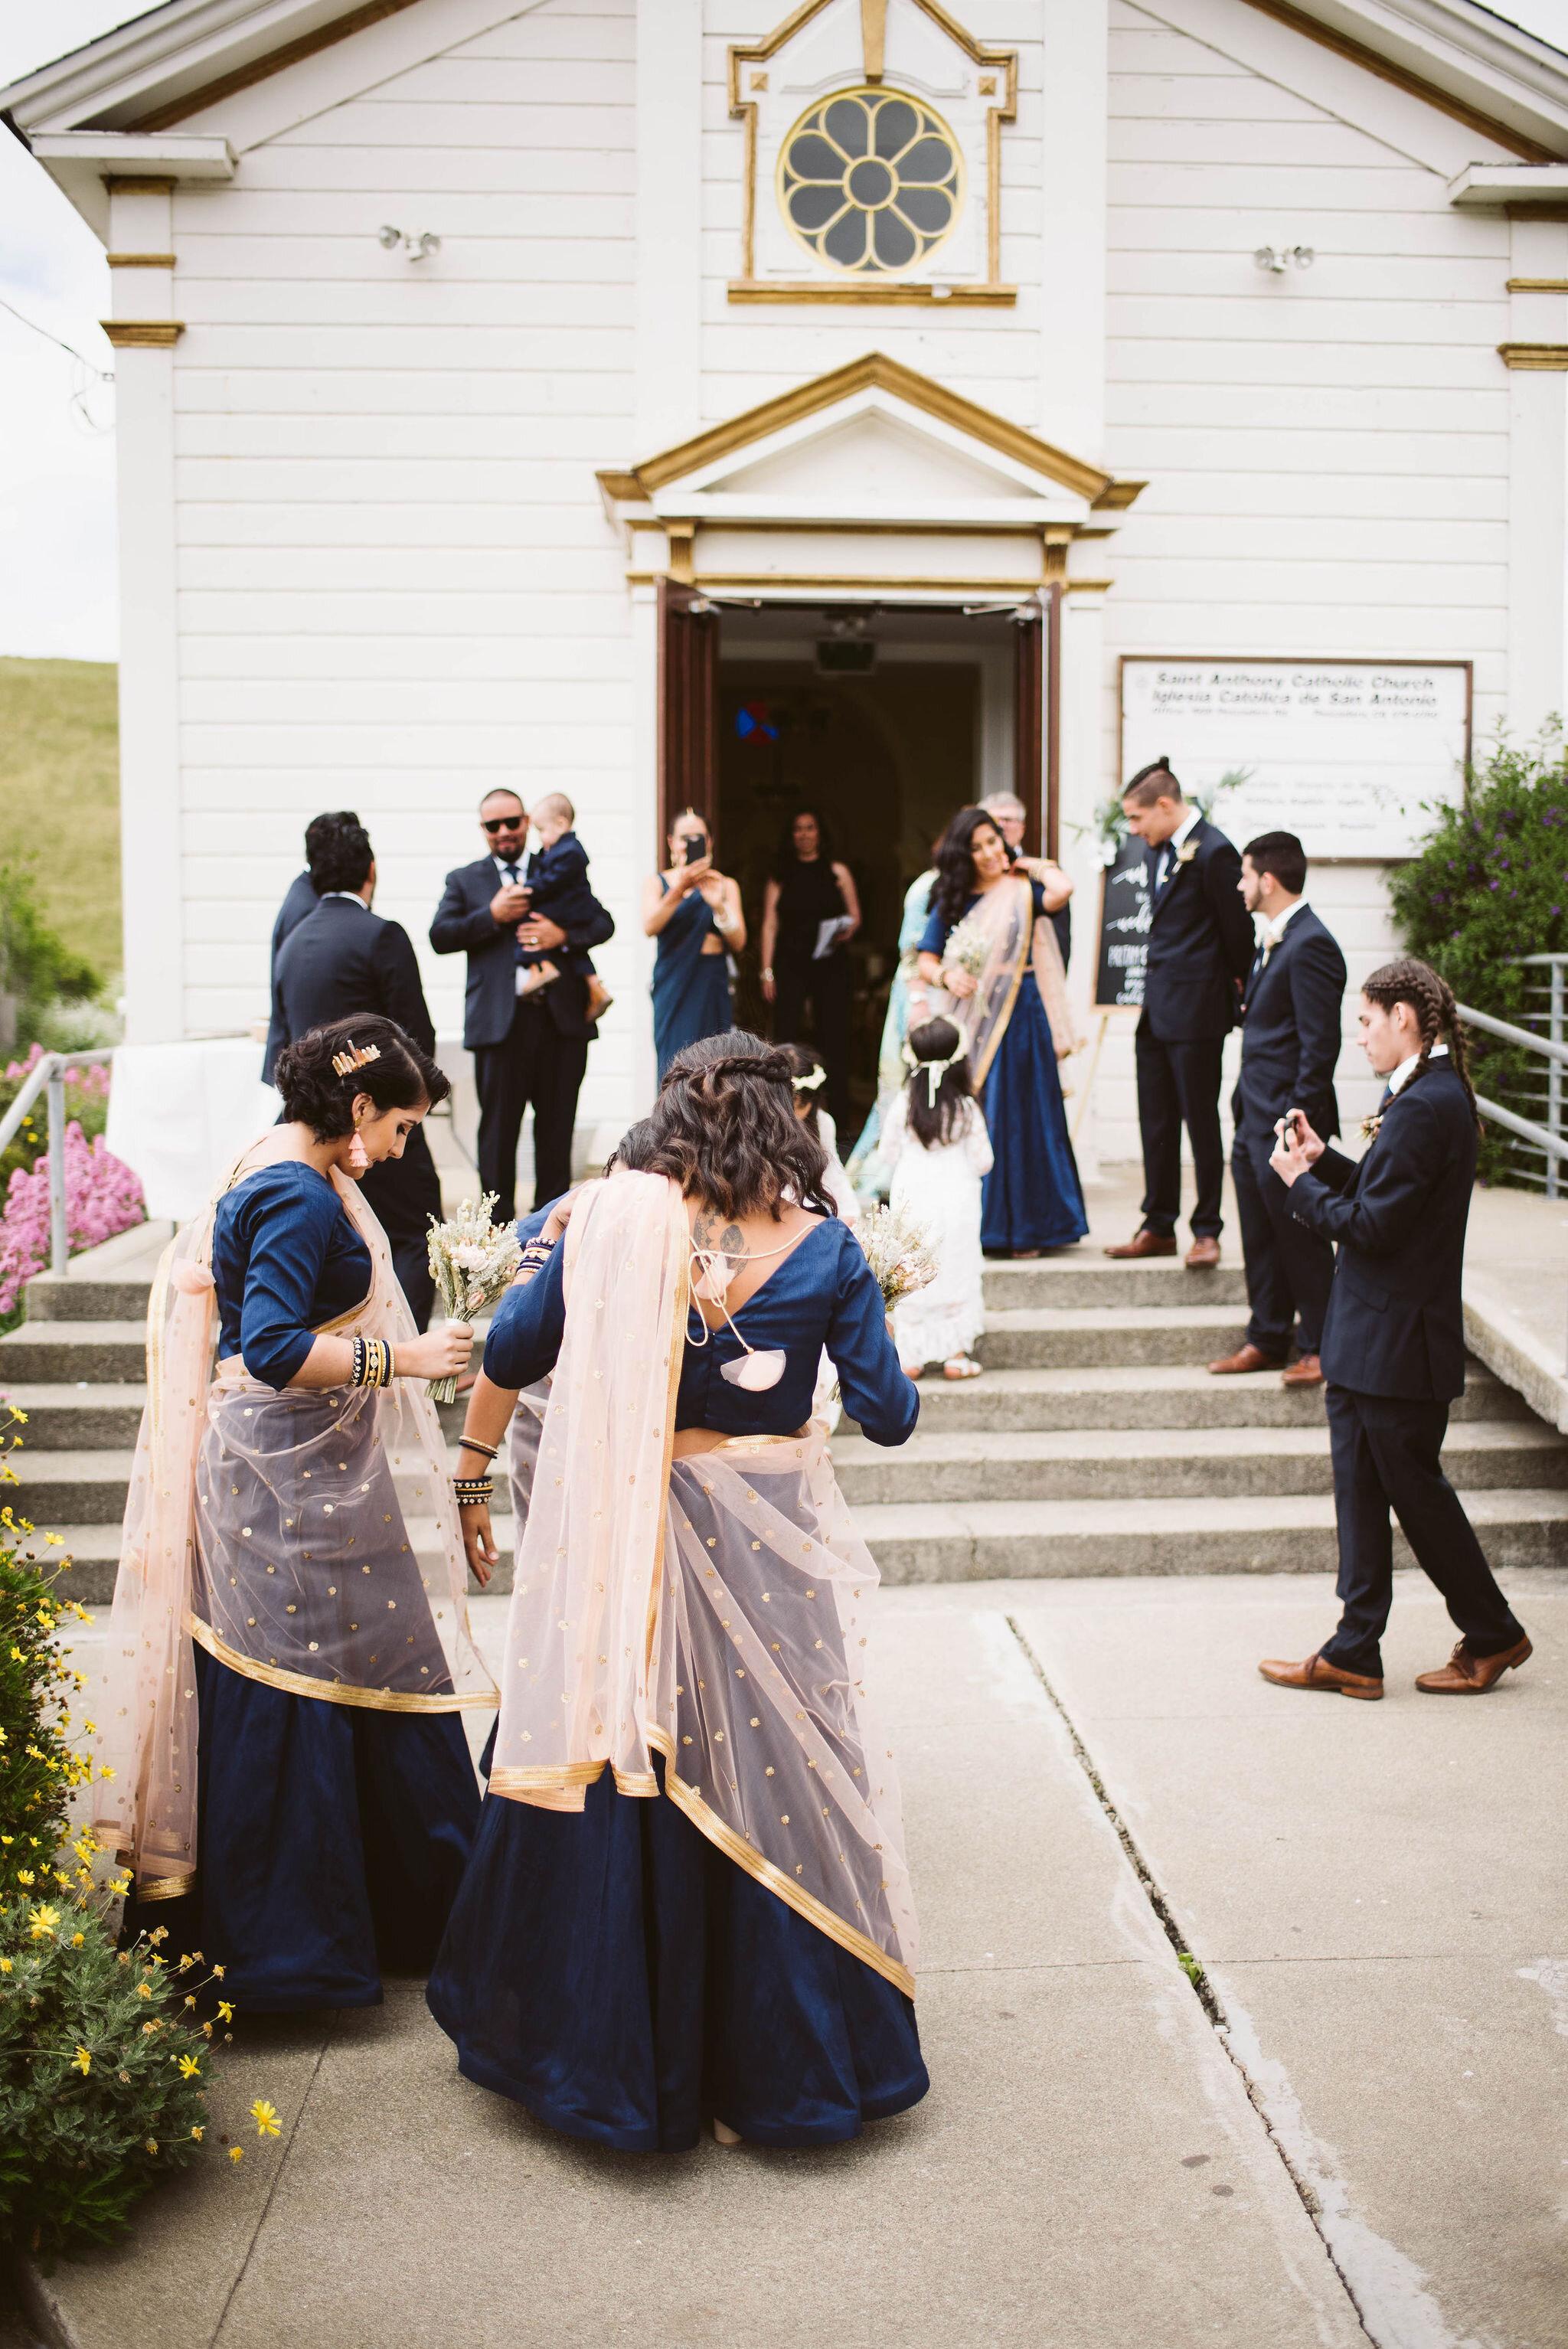 Venture-Retreat-Center-Wedding-Pescadero-Sat-Aaron-Pritam-The-Shalom-Imaginative-177.jpg